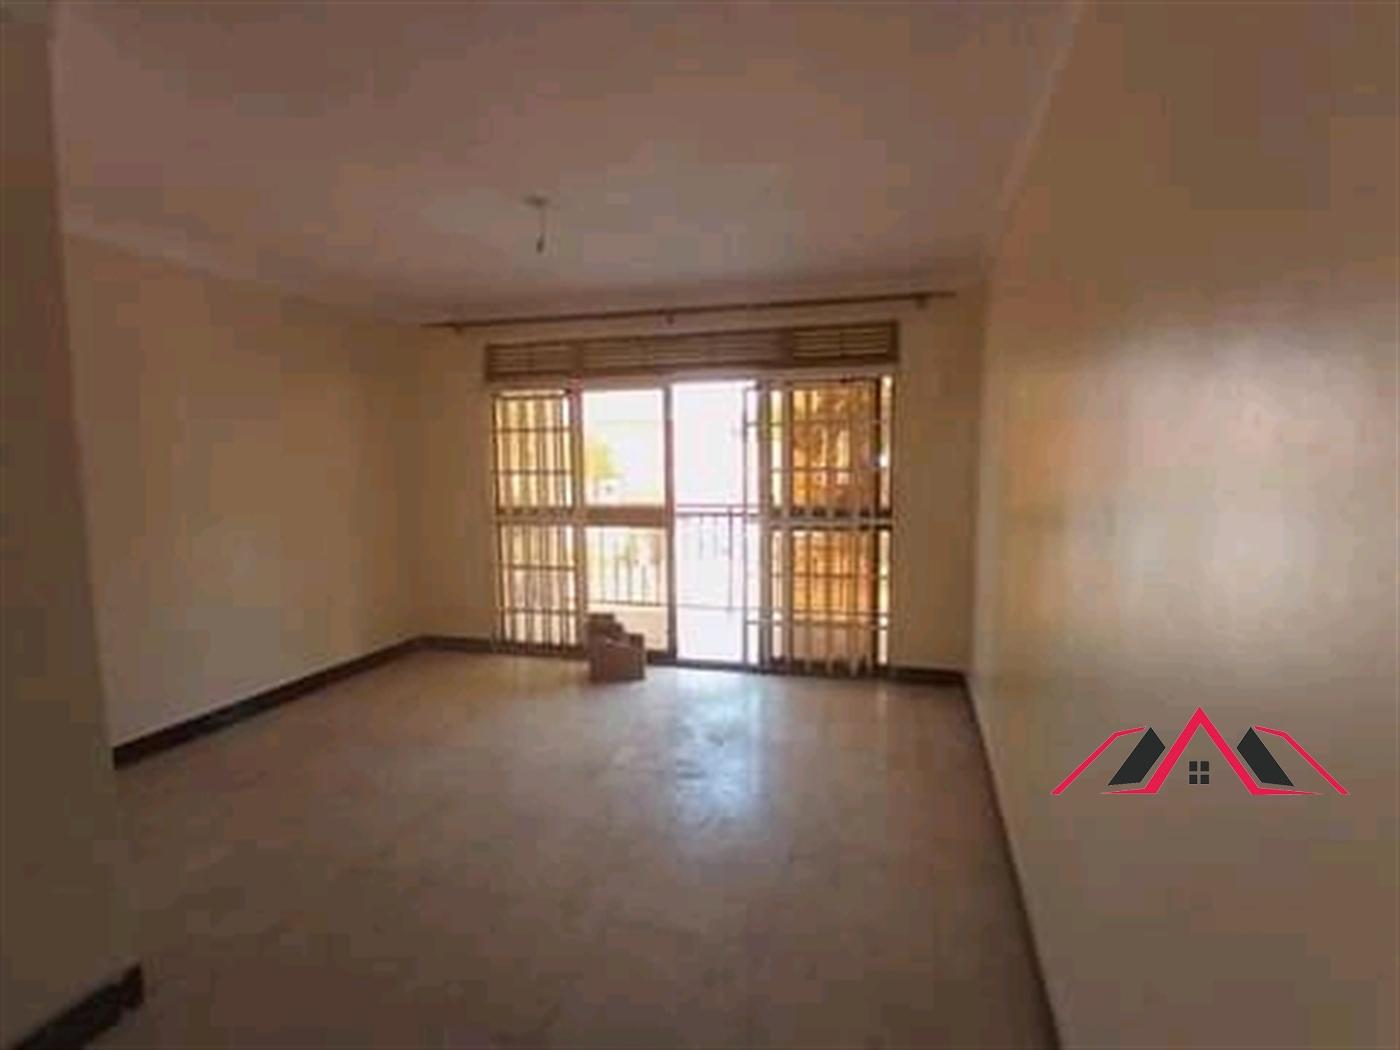 Apartment for rent in Munyonyo Kalangala